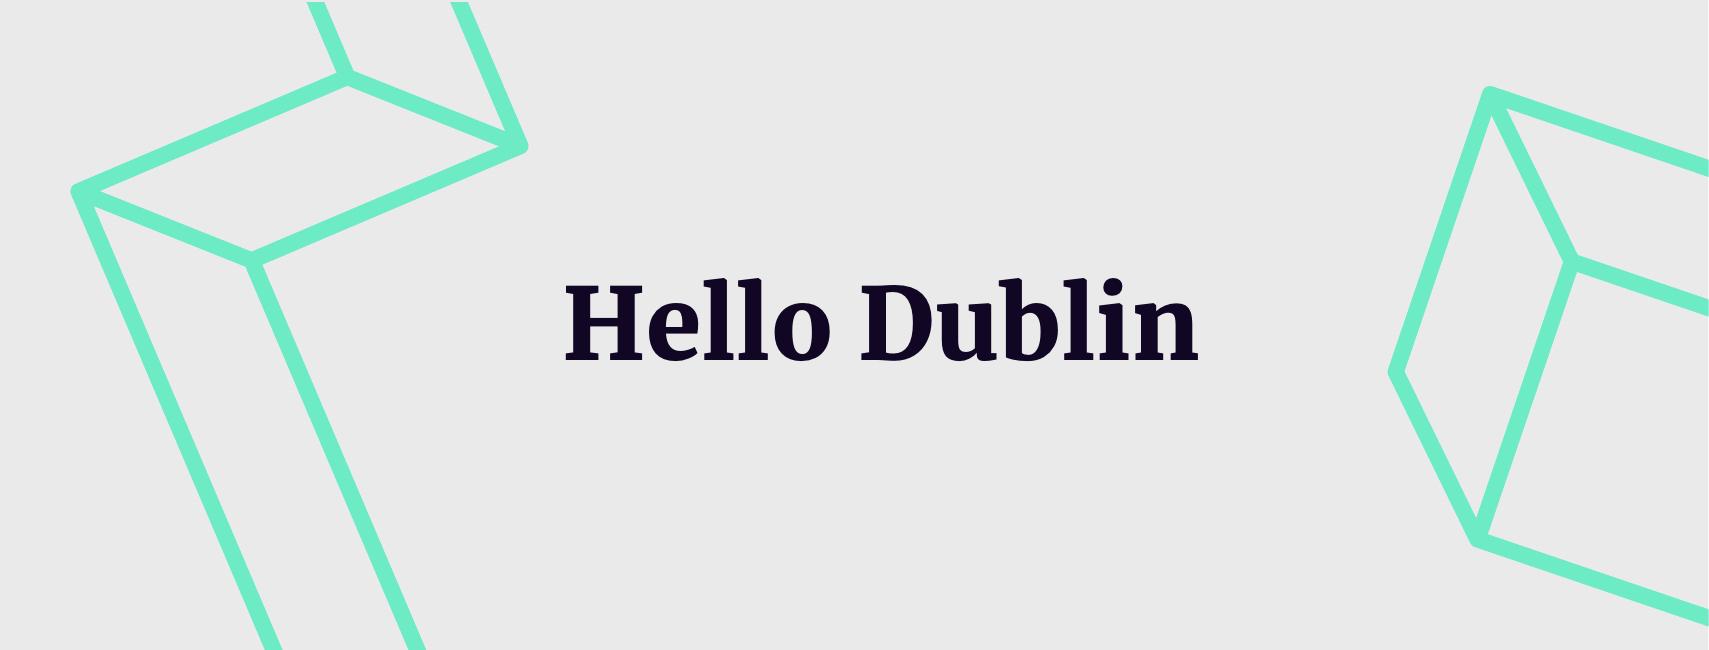 Hello Dublin.png